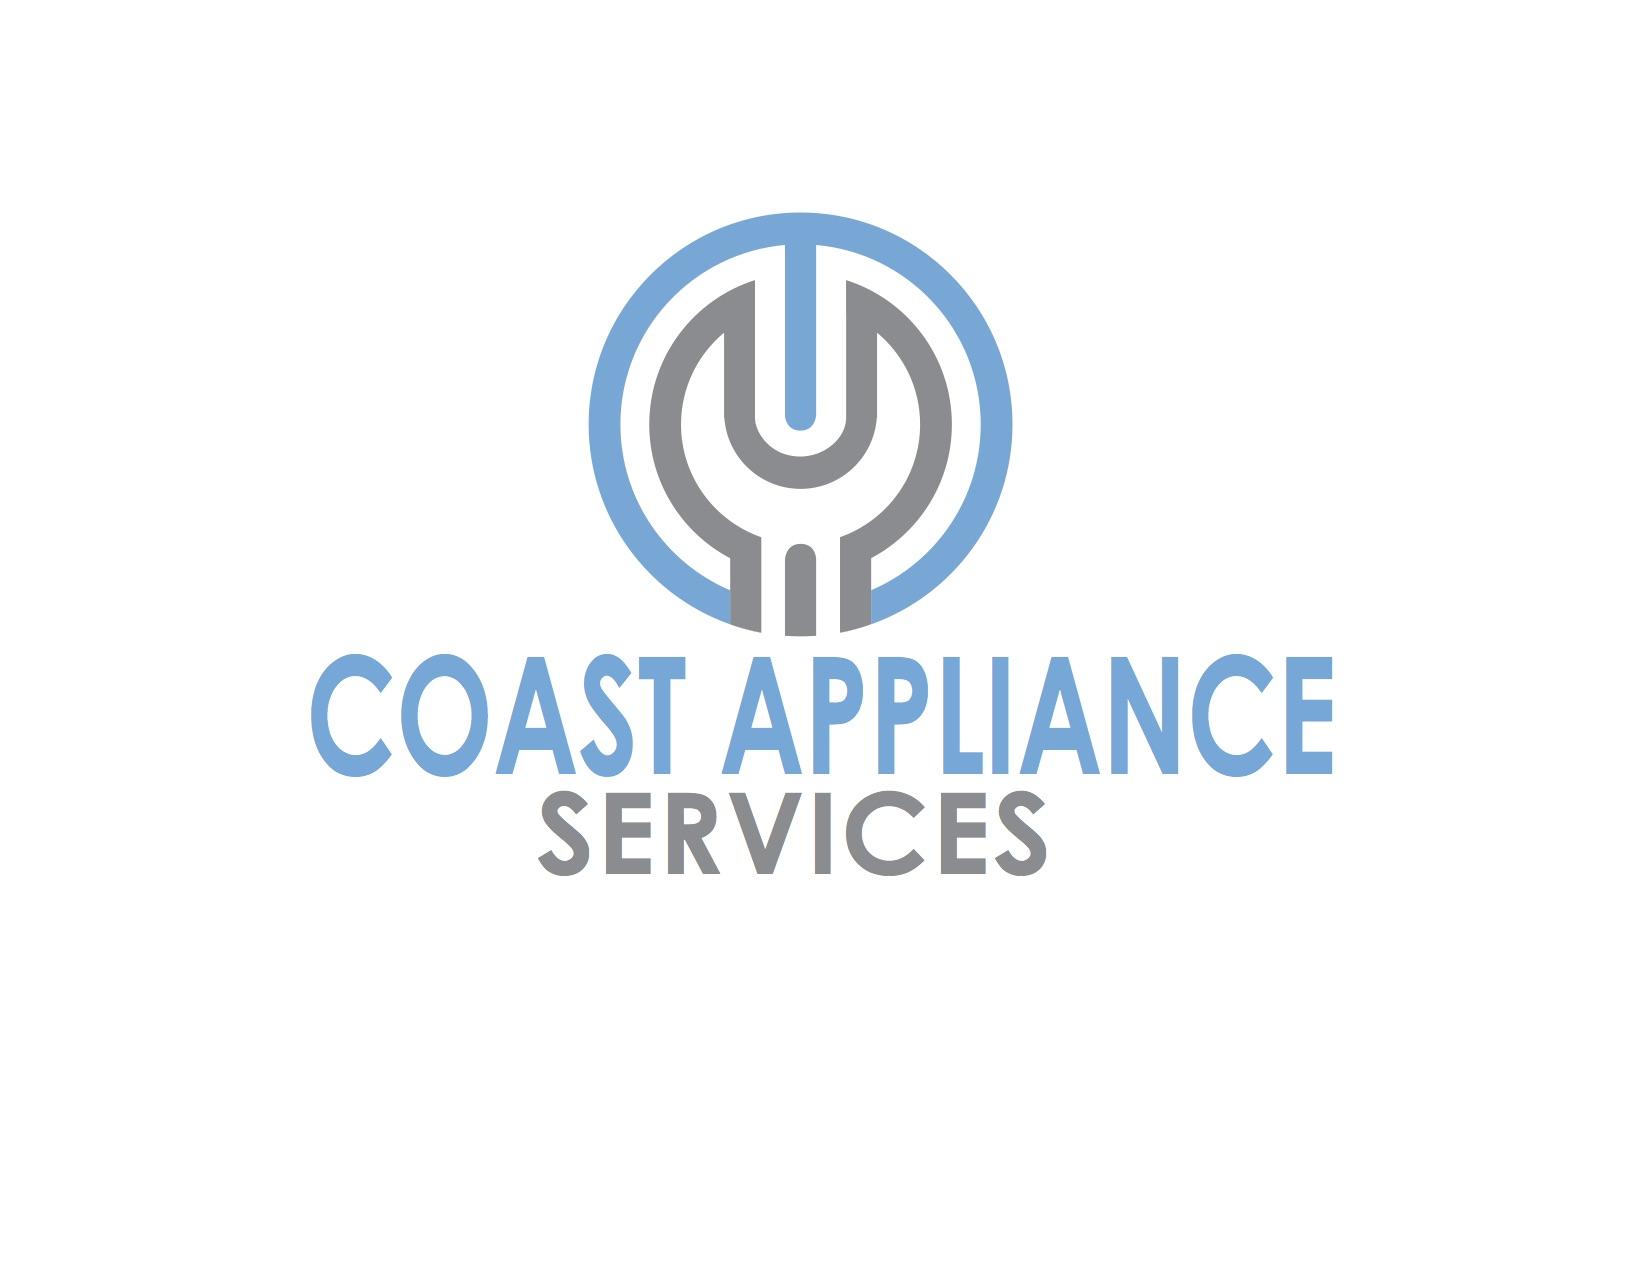 Coast Appliance Services